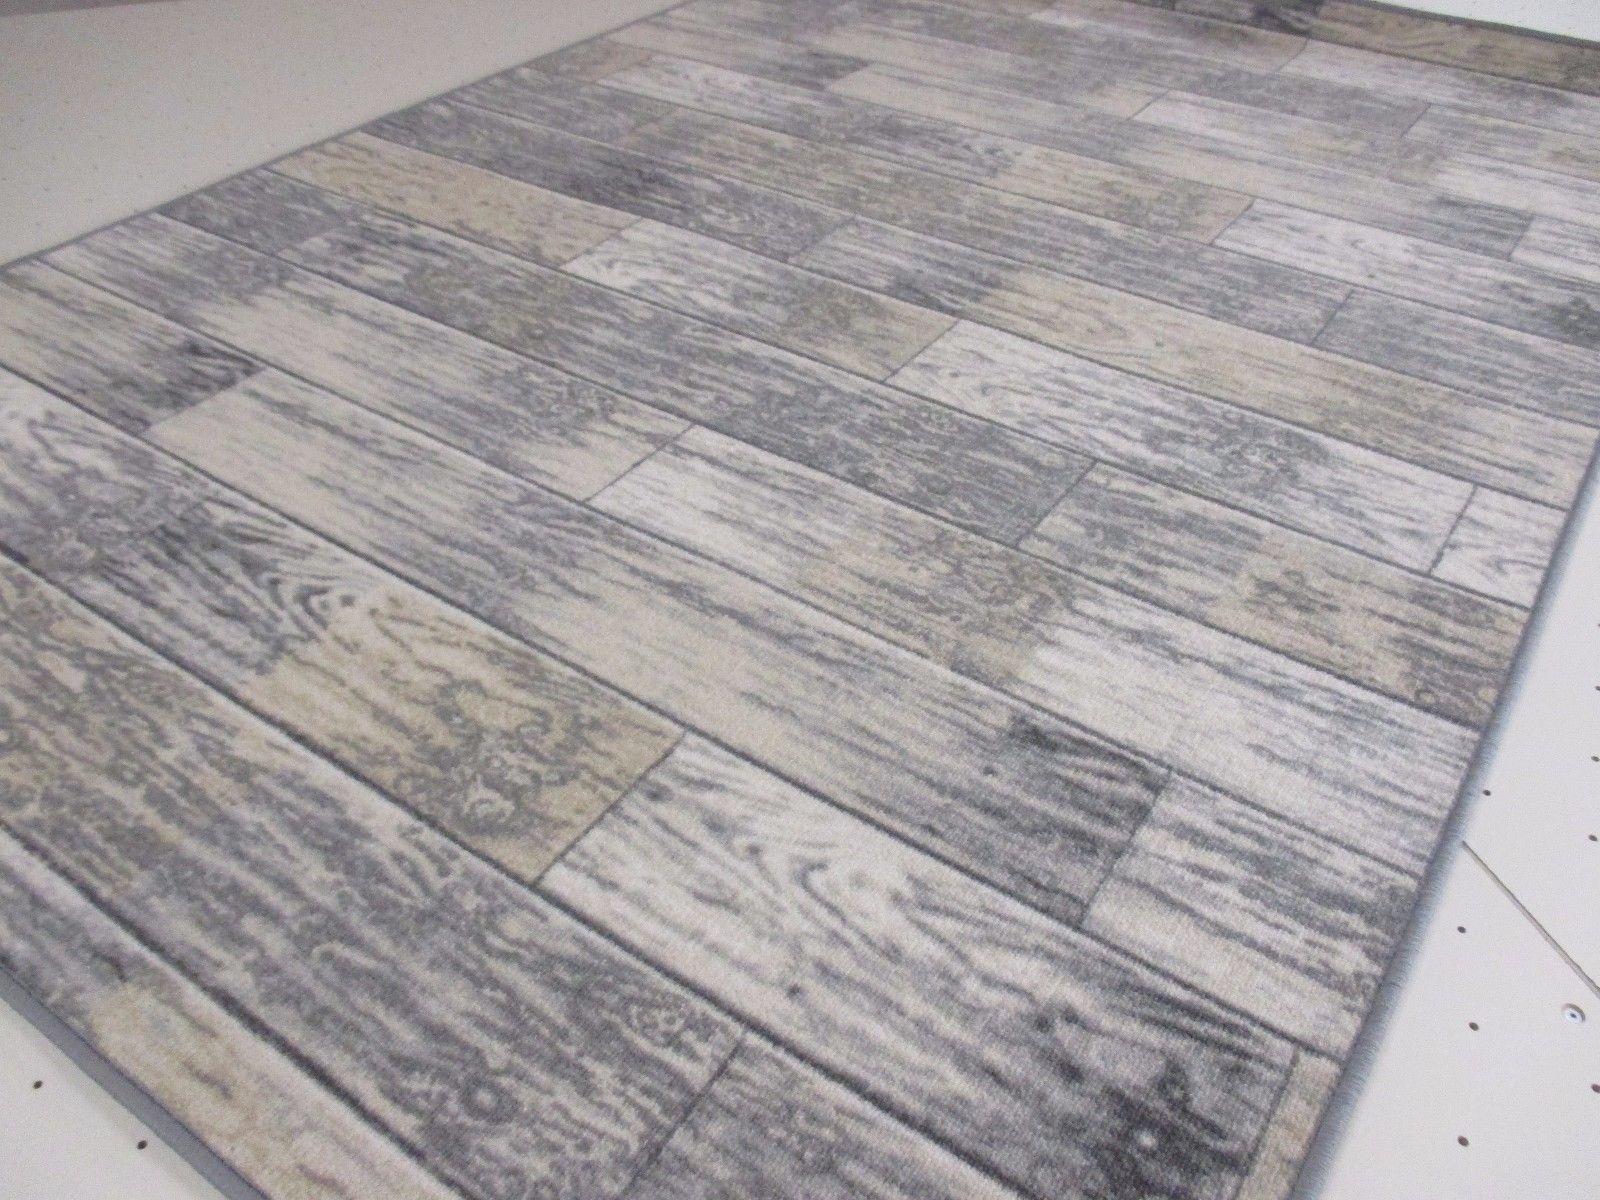 Exclusiver Moderner Design Teppich Holz Optik Silber Grau 160 x 230 cm